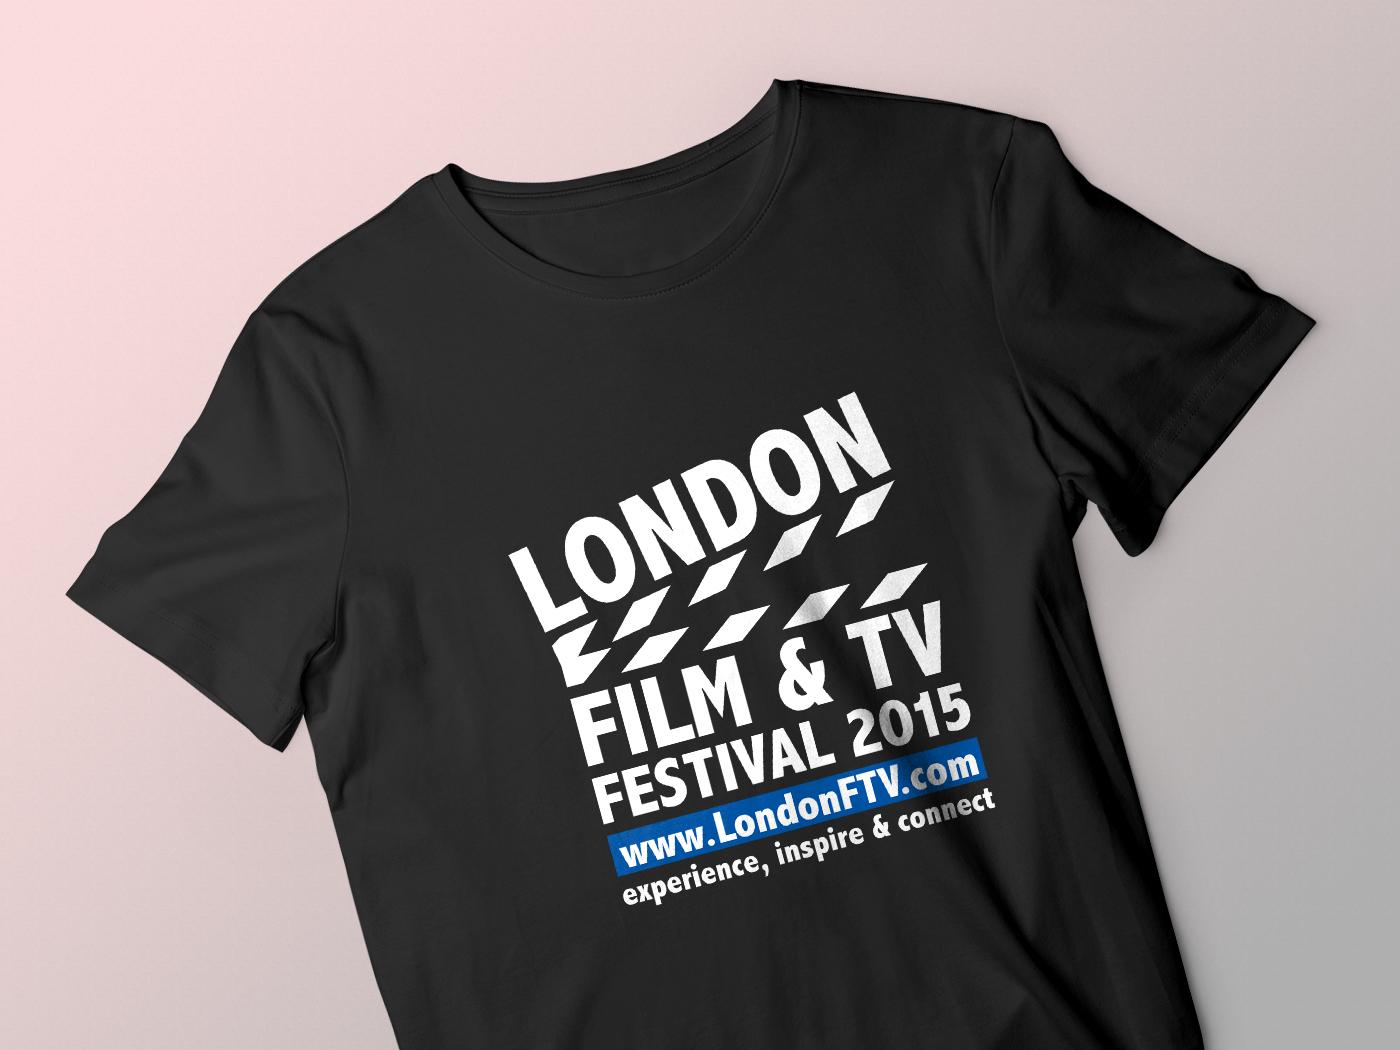 London Film Tv Festival 2015 T Shirt By Ayesha Akter Dribbble